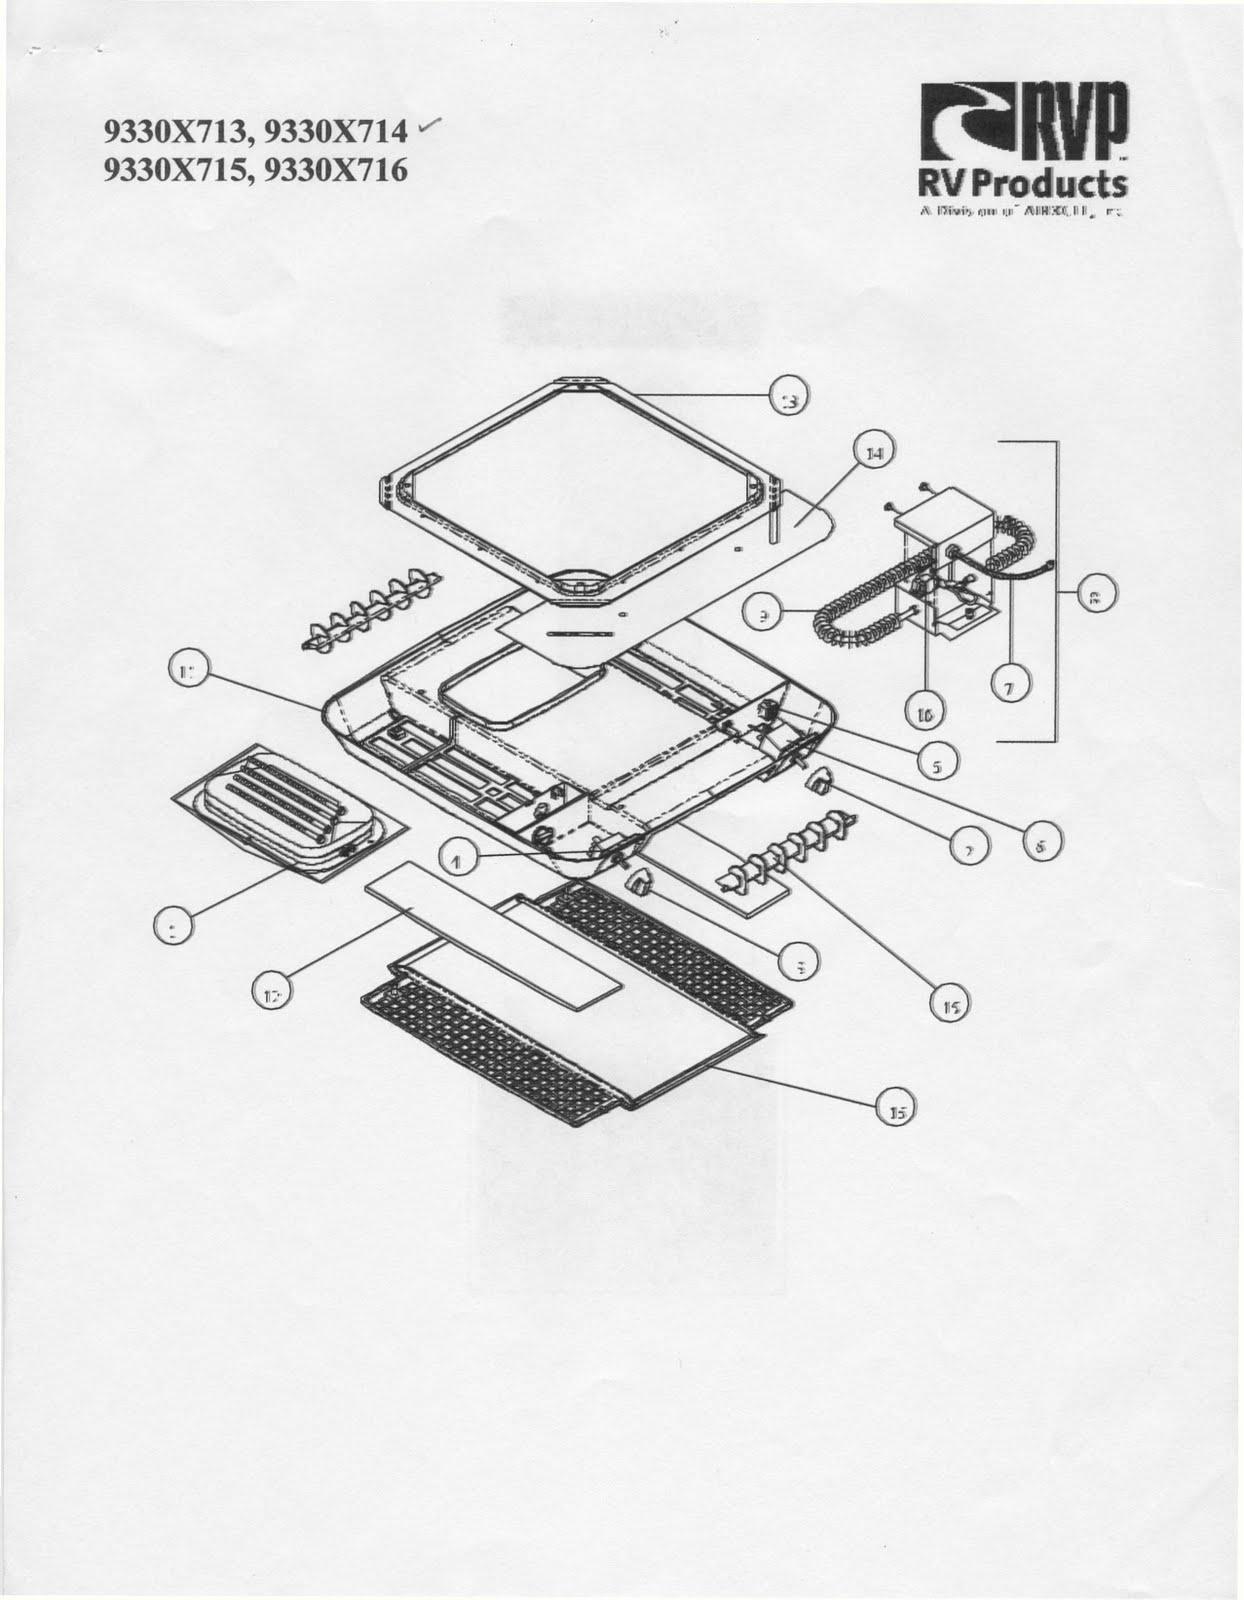 1984 pace arrow wiring diagram [ 1244 x 1600 Pixel ]